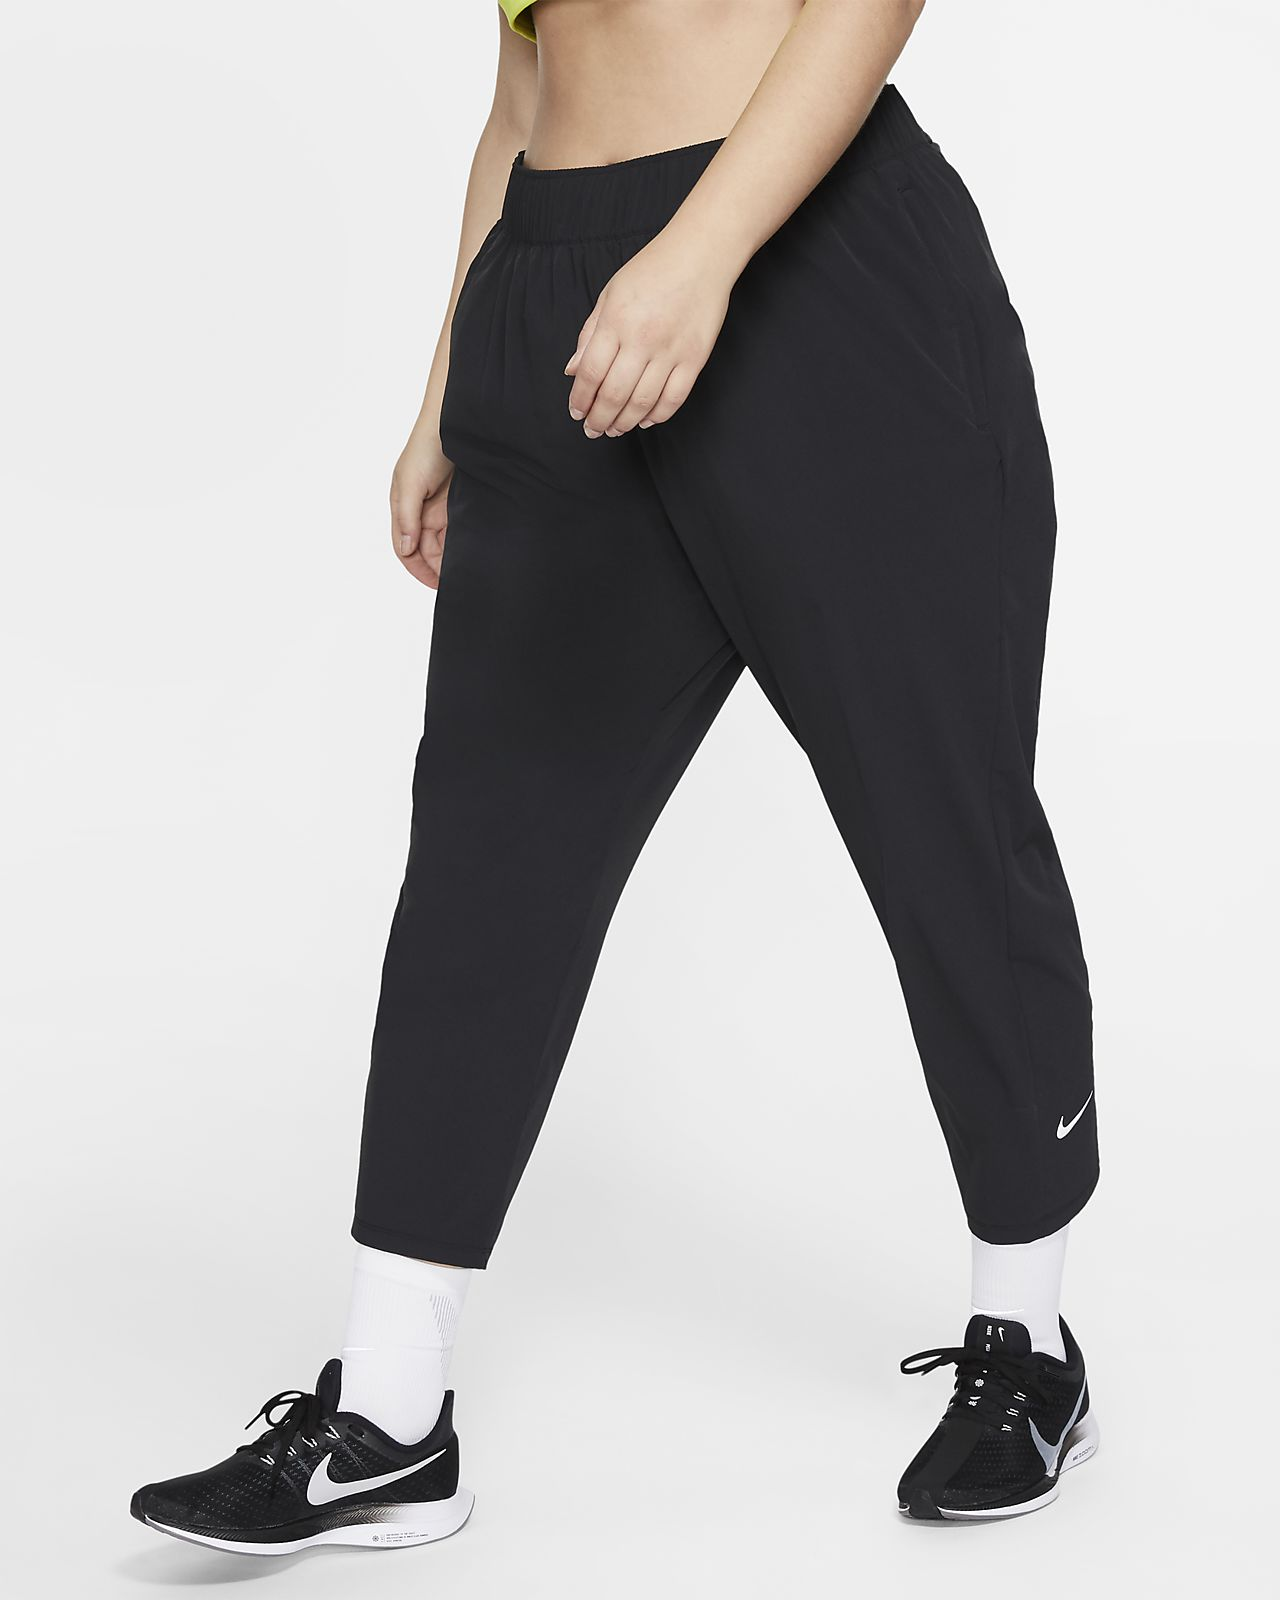 Nike Essential 7/8-hardloopbroek voor dames (grote maten)